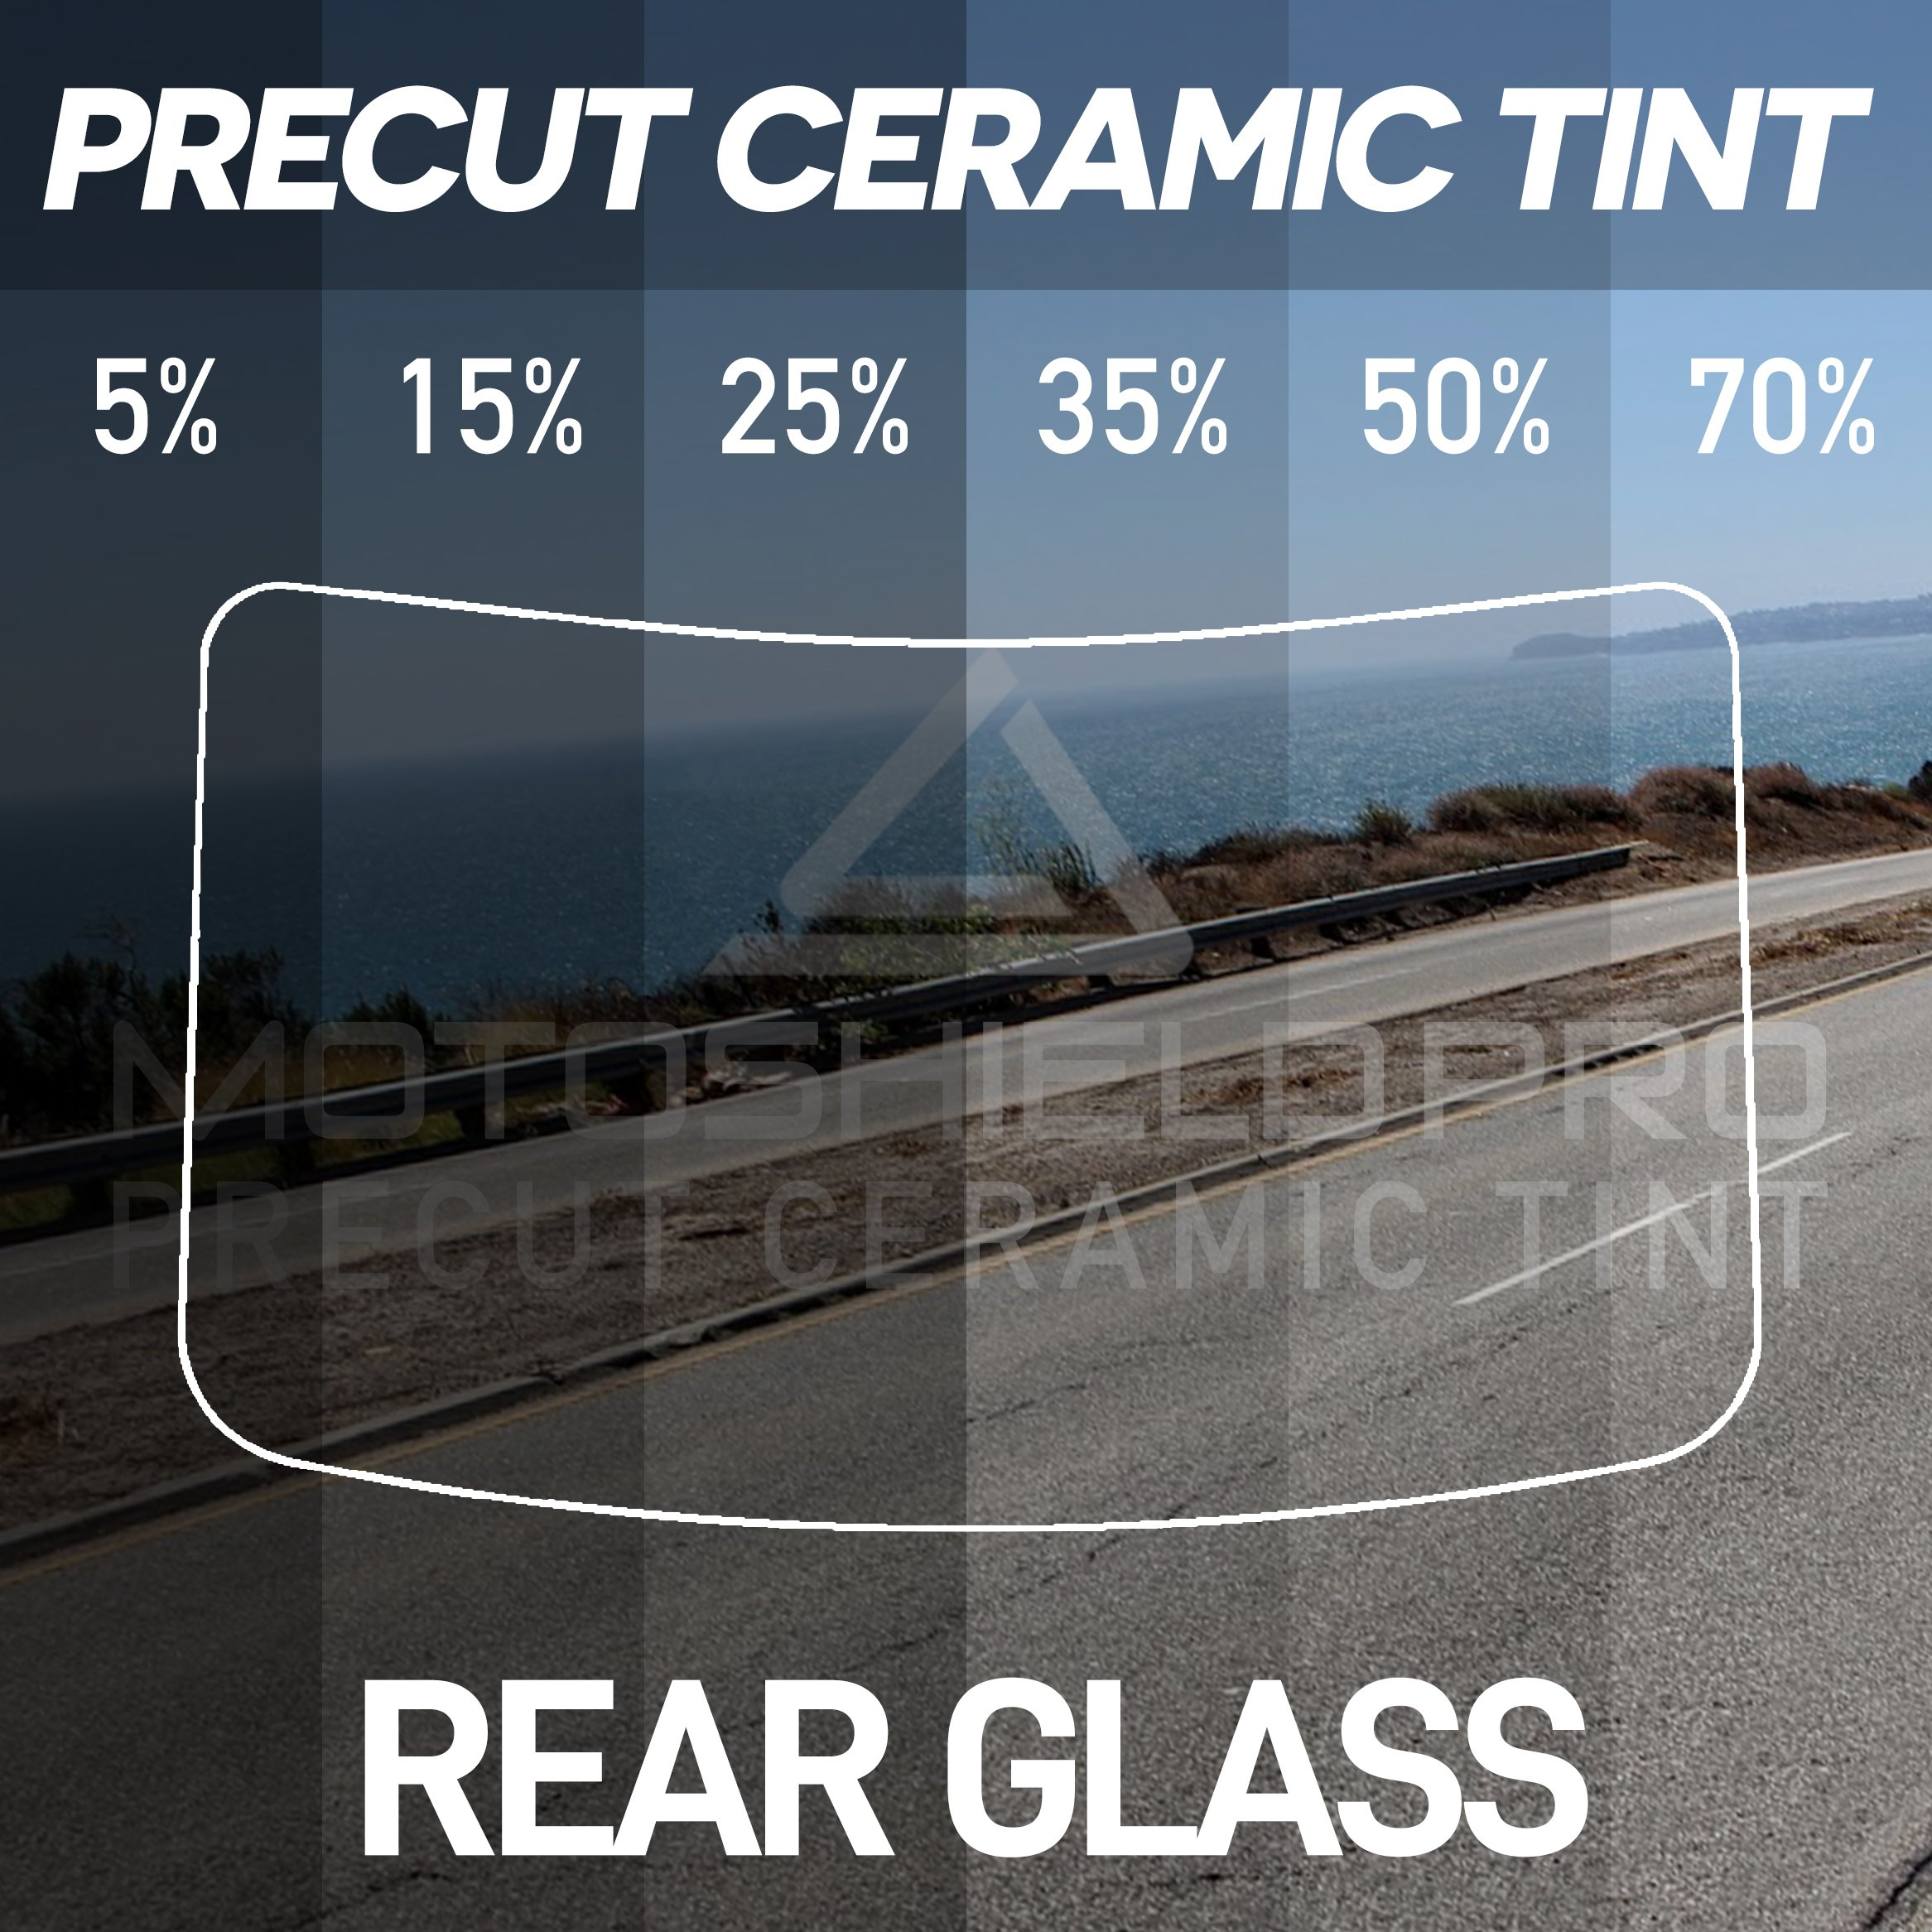 MotoShield Pro Precut Ceramic Tint Film [Blocks Up to 99% of UV/IRR Rays] Window Tint for Cars - Rear Glass Only, Any Tint Shade